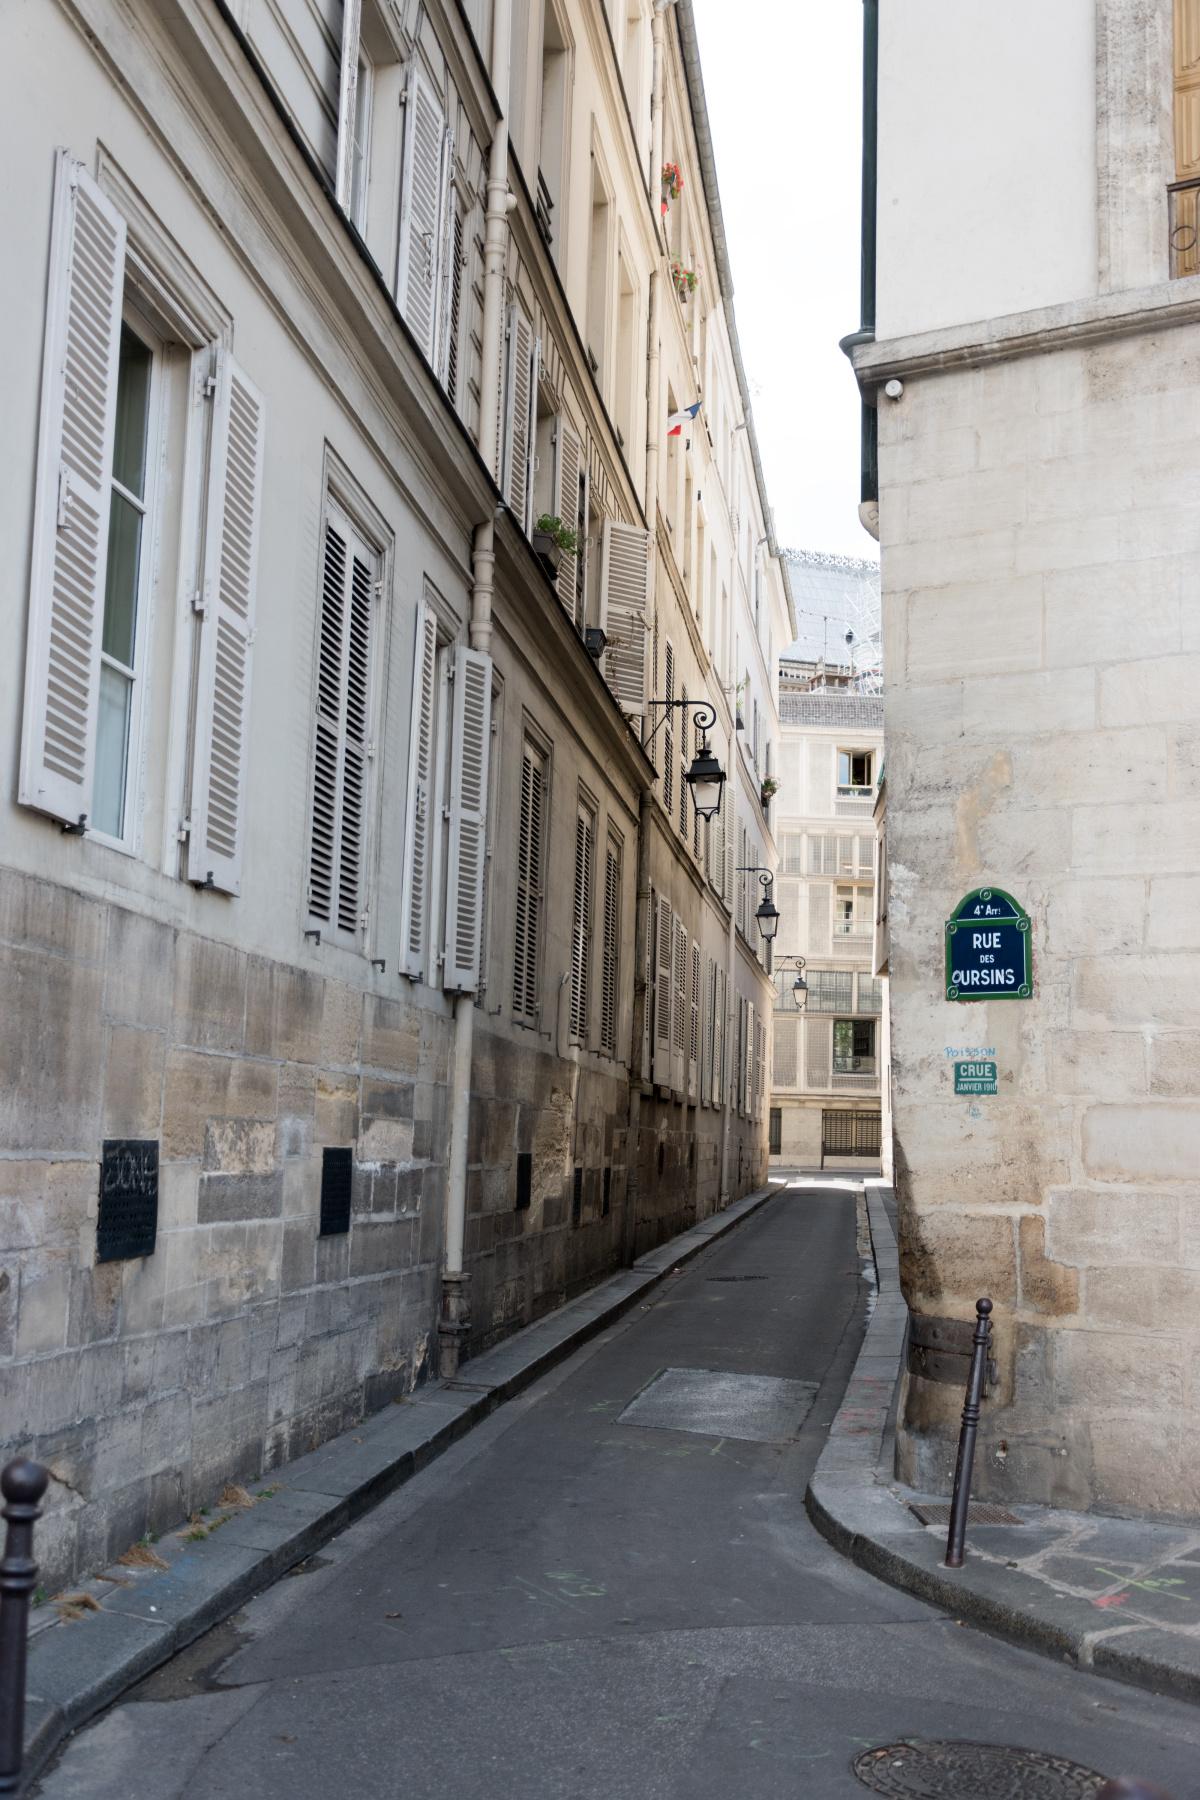 Rue des Oursins